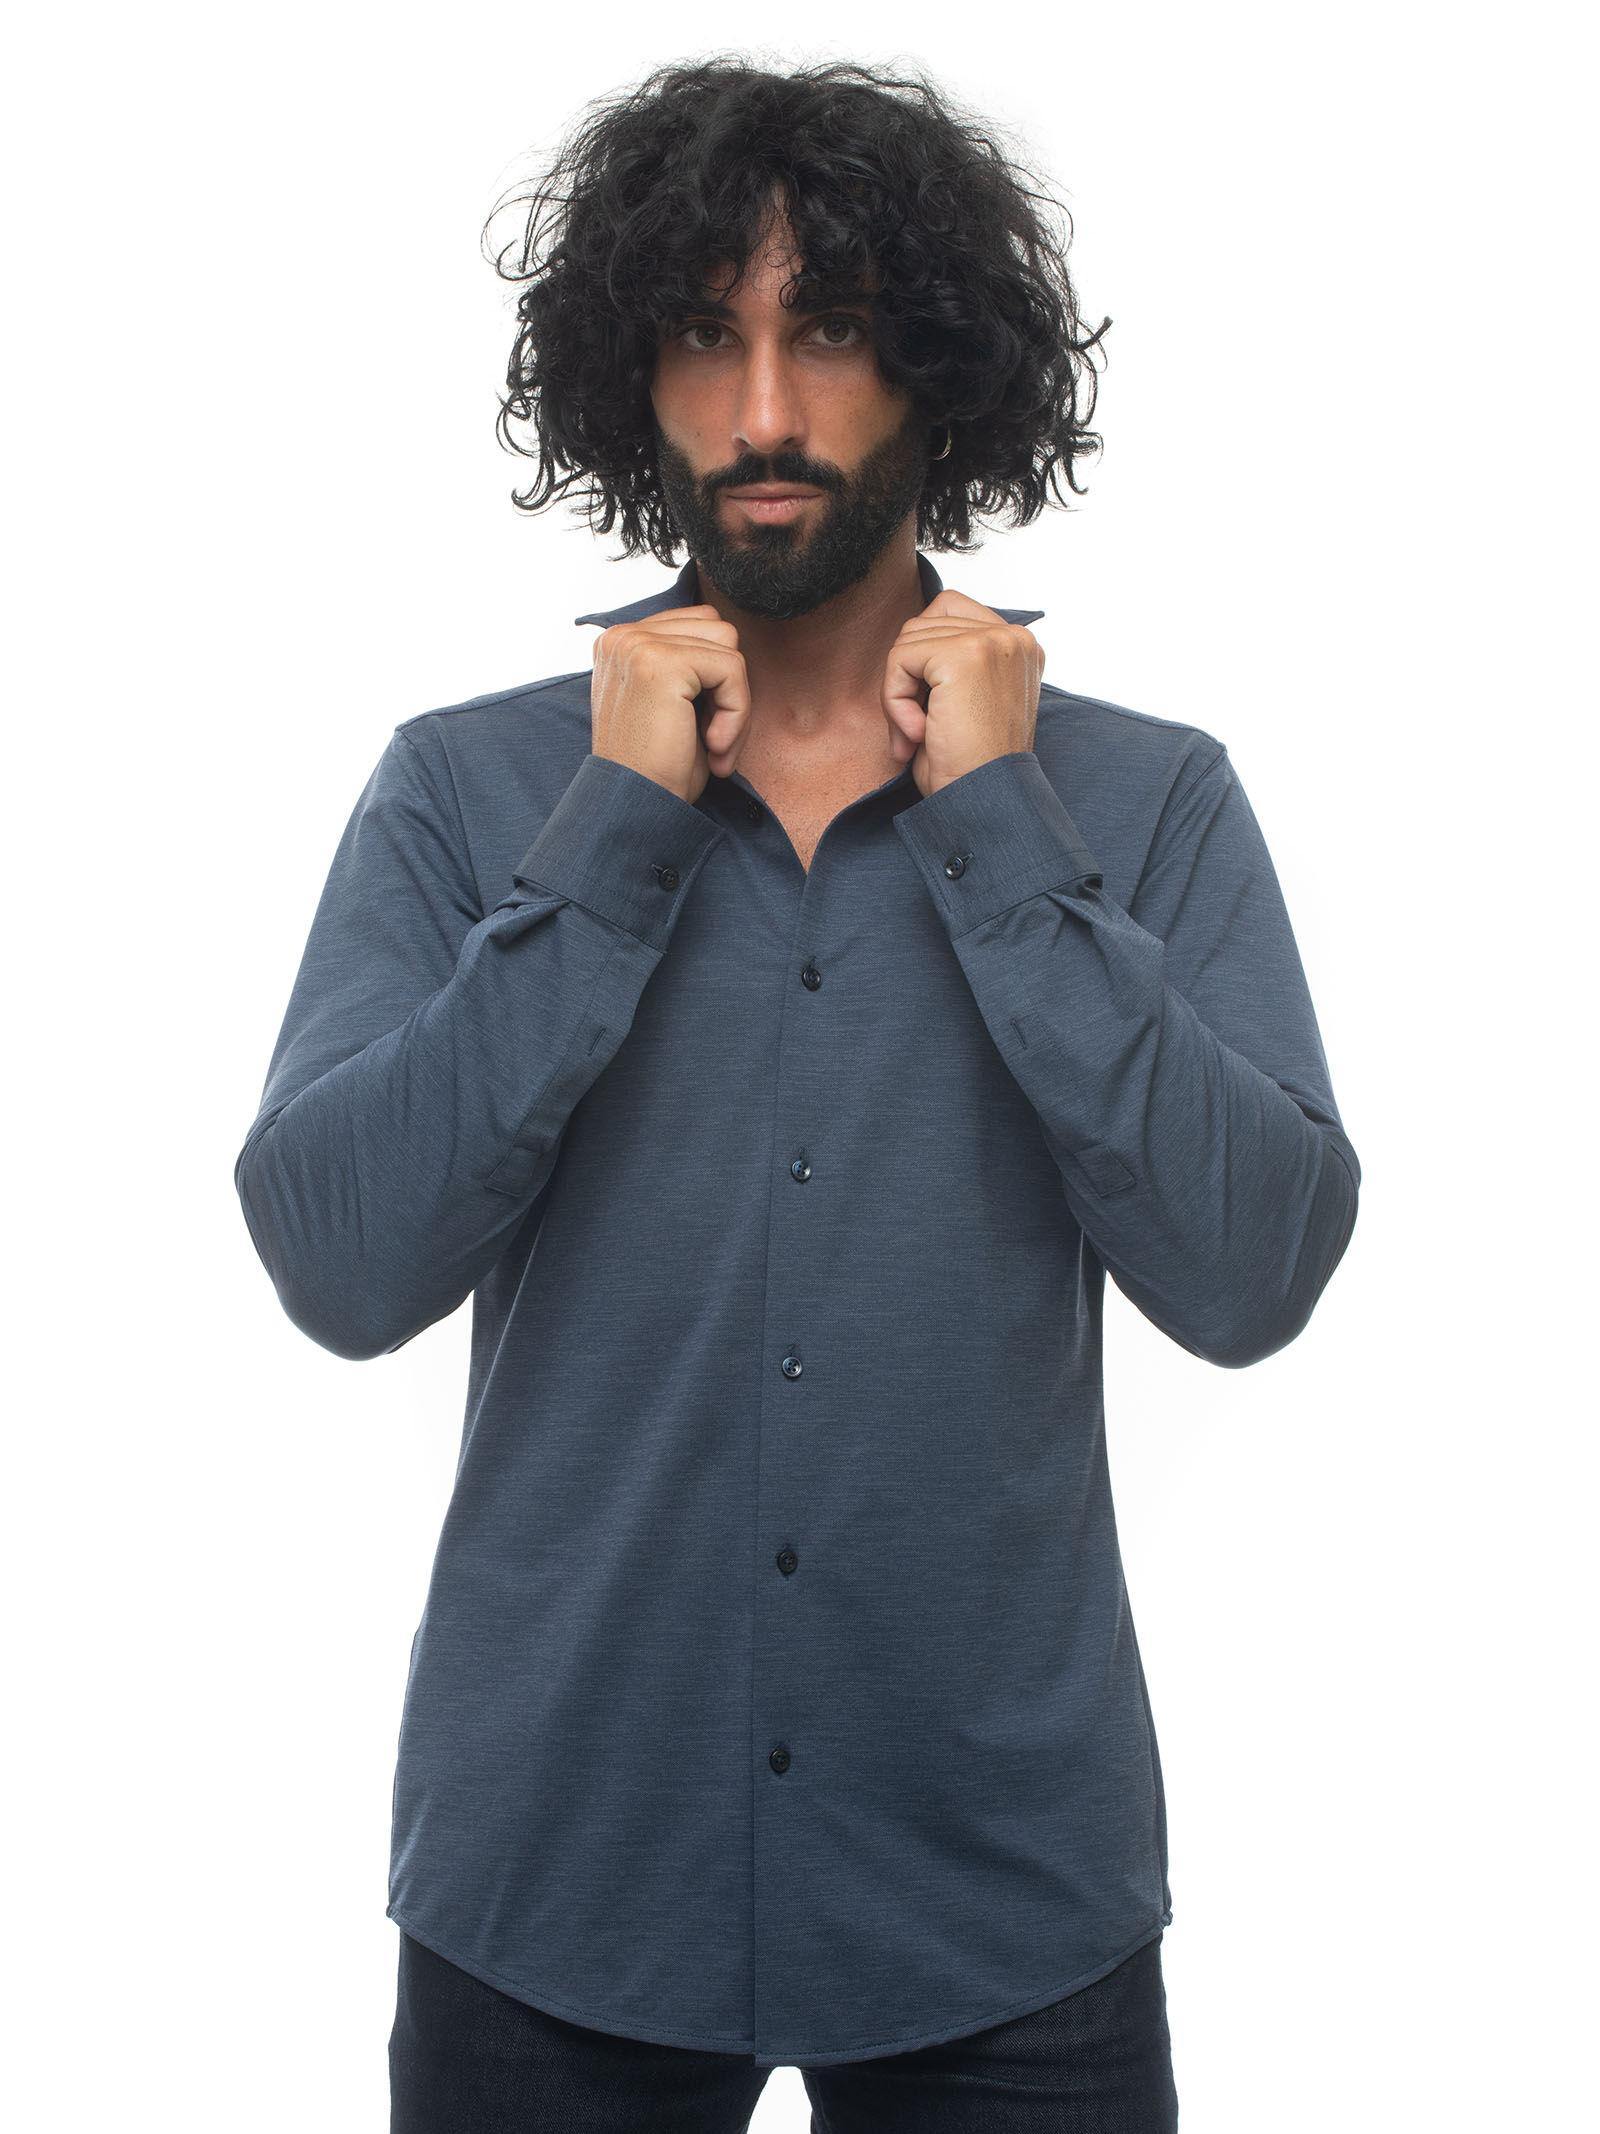 Boss Camicia casual Blu denim Poliammide Uomo